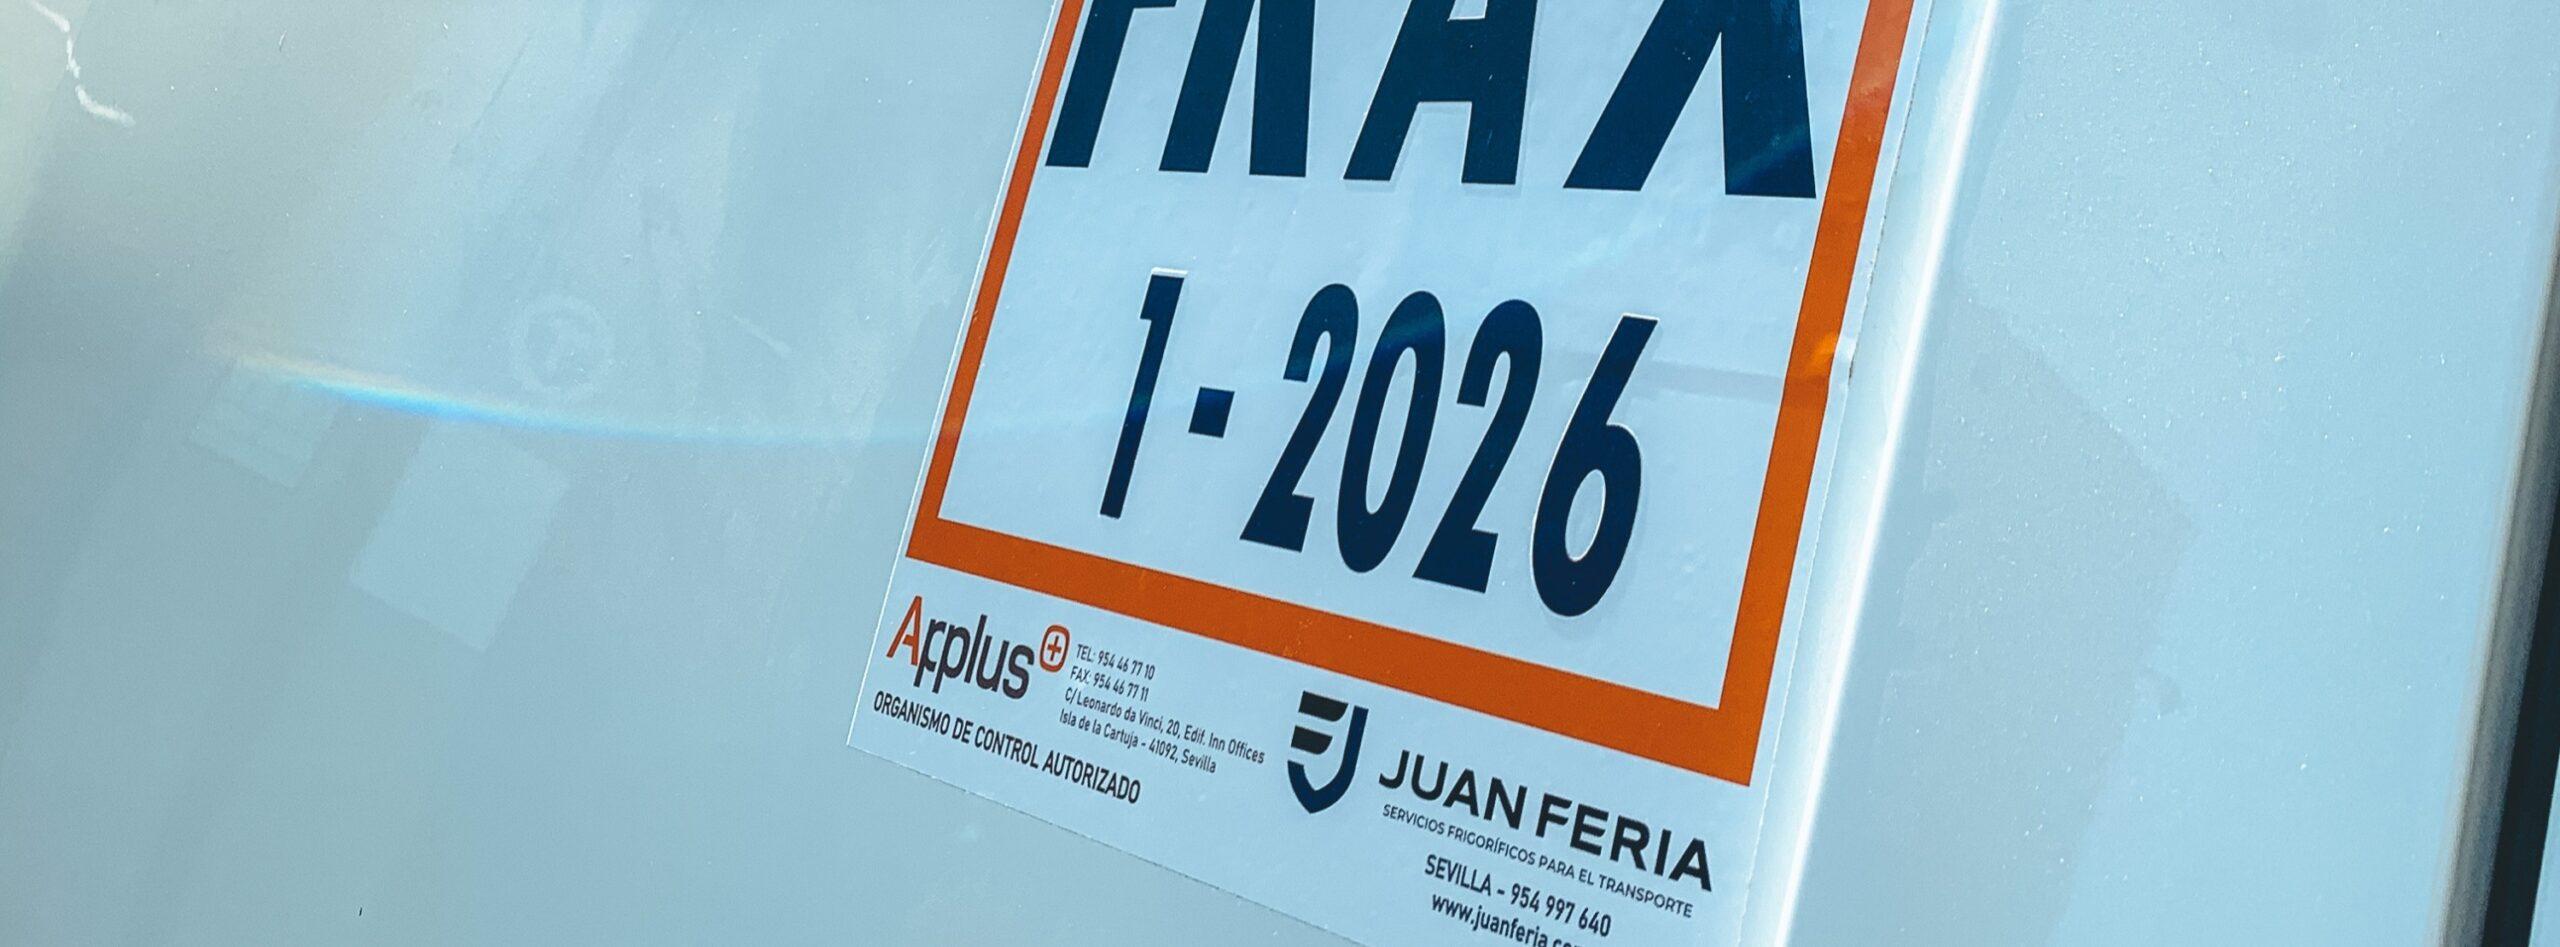 Inspeccion-ATP-Sevilla